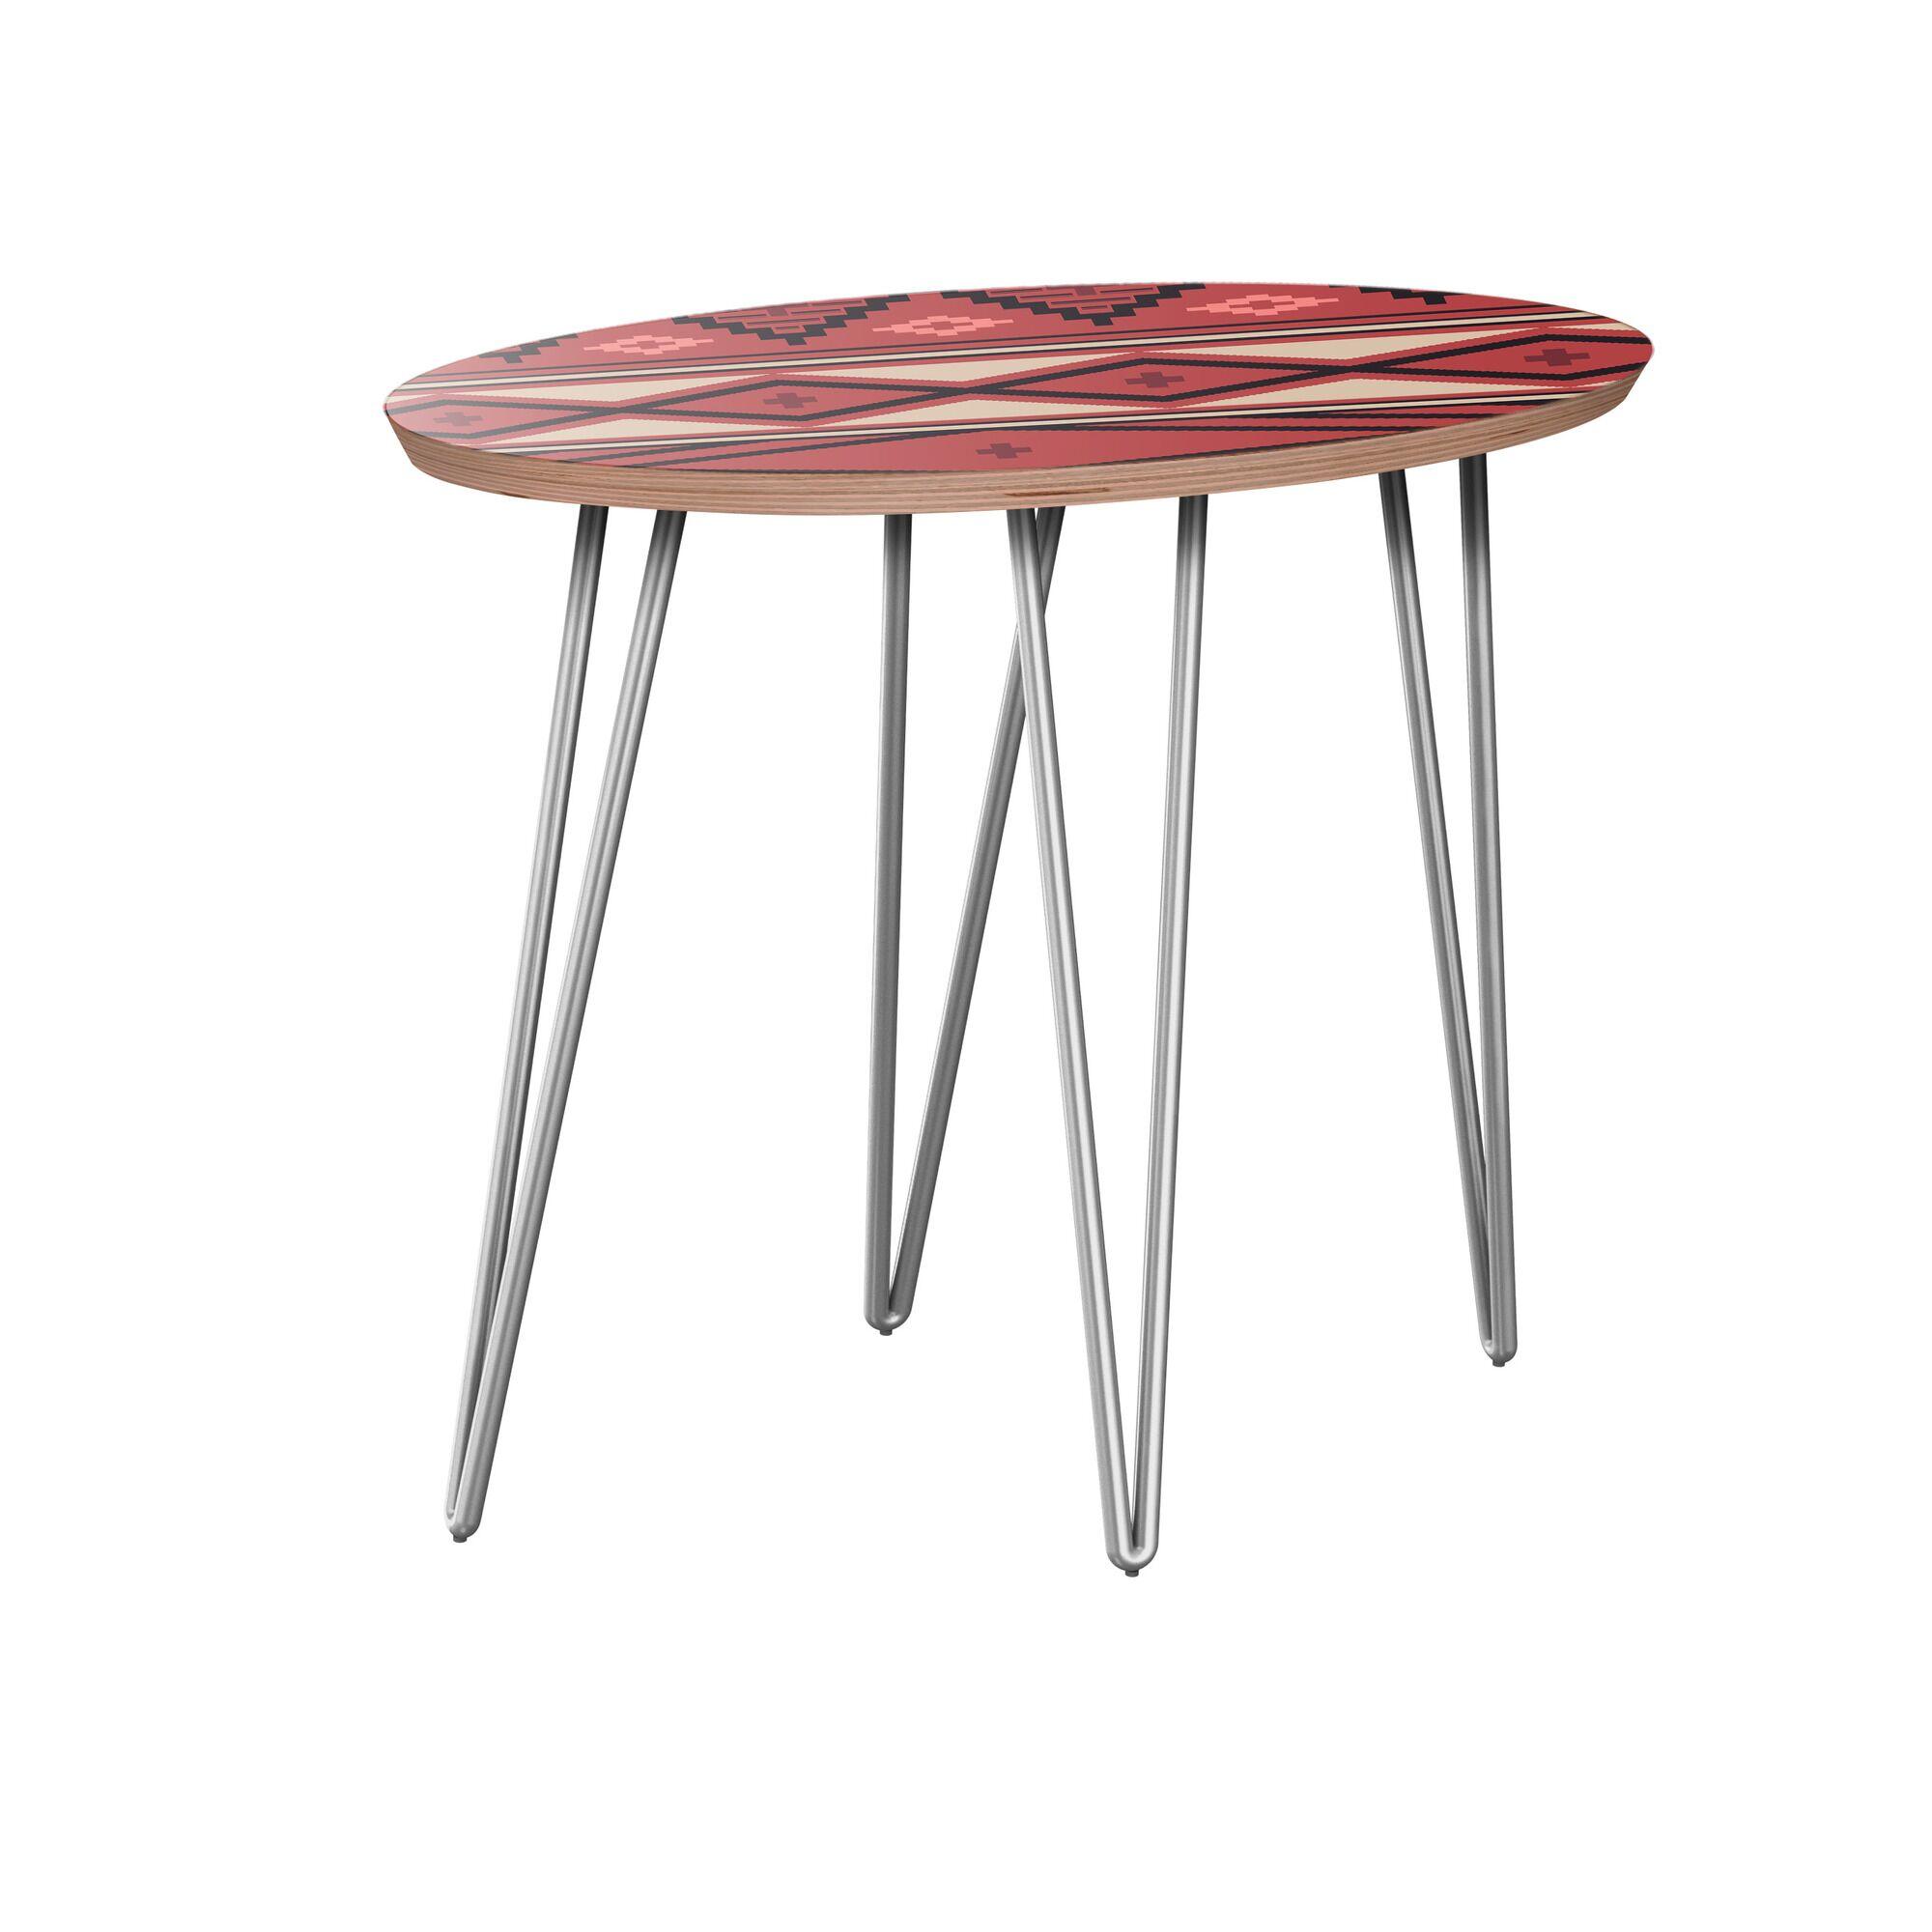 Holderman End Table Table Base Color: Chrome, Table Top Boarder Color: Walnut, Table Top Color: Red